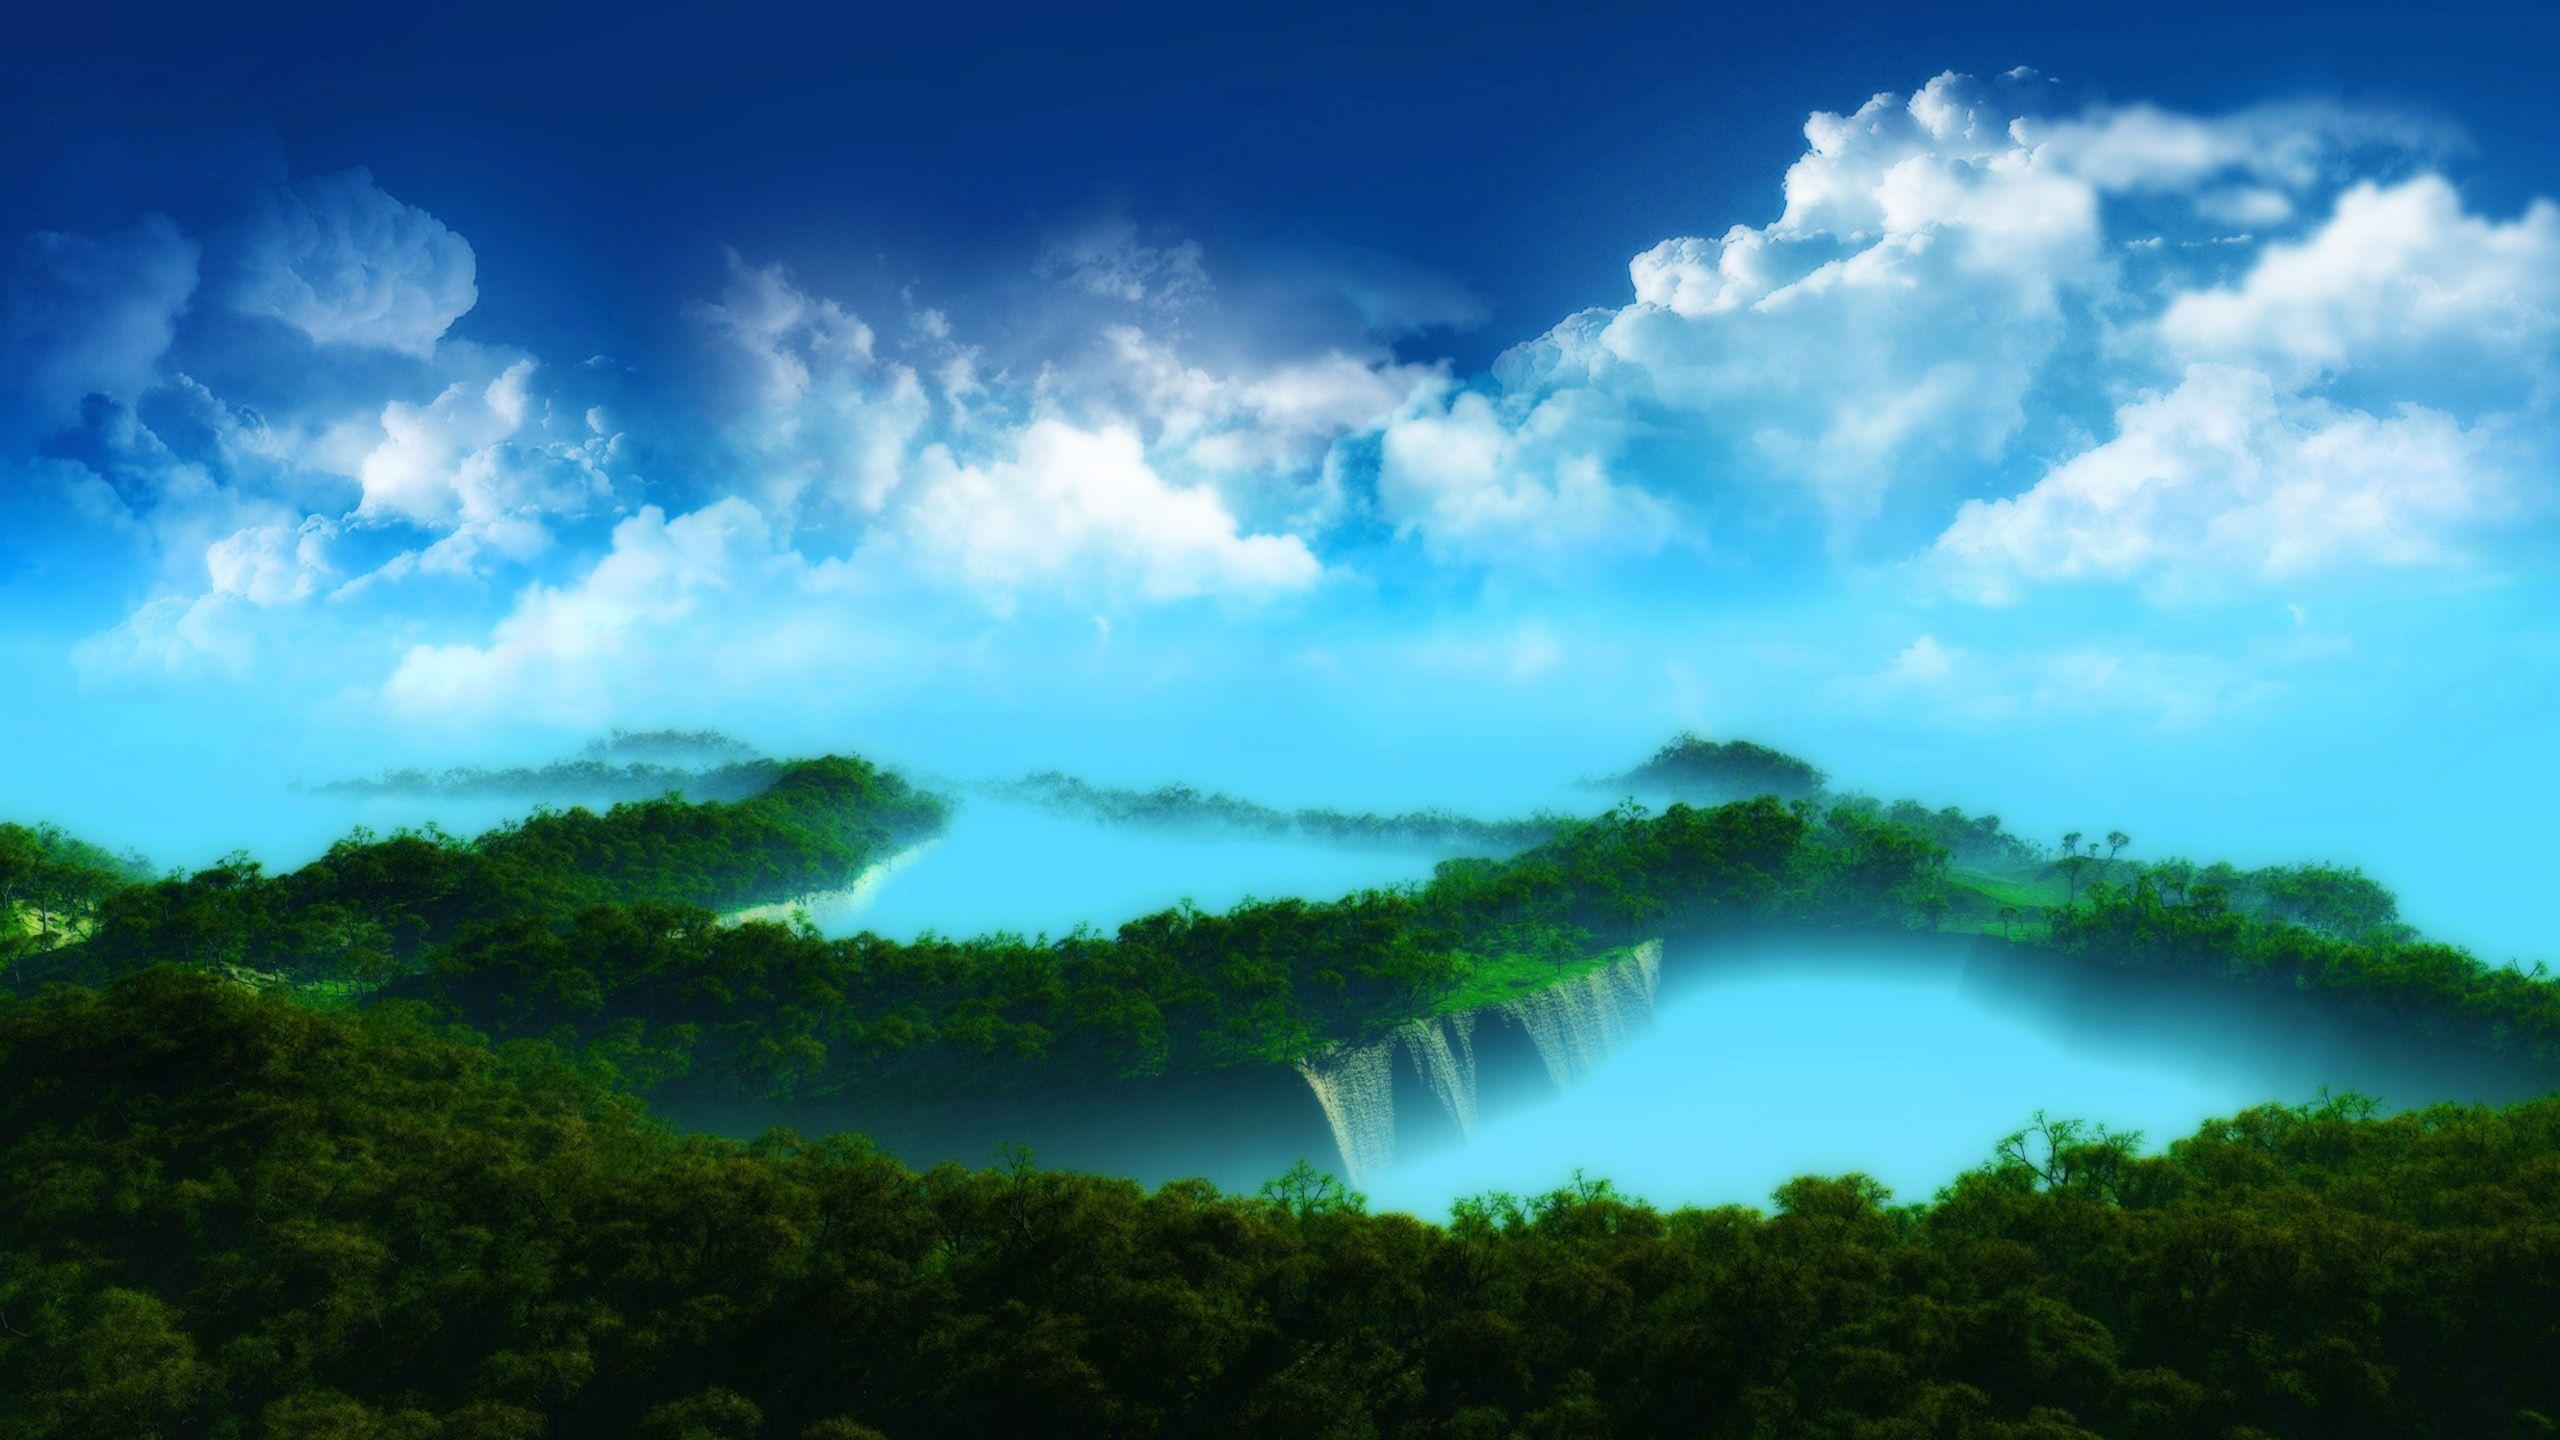 Mystical Paradise Wallpaper From Www Hdwallpapershere Com Beautiful Nature Wallpaper Hd Hd Nature Wallpapers Nature Wallpaper